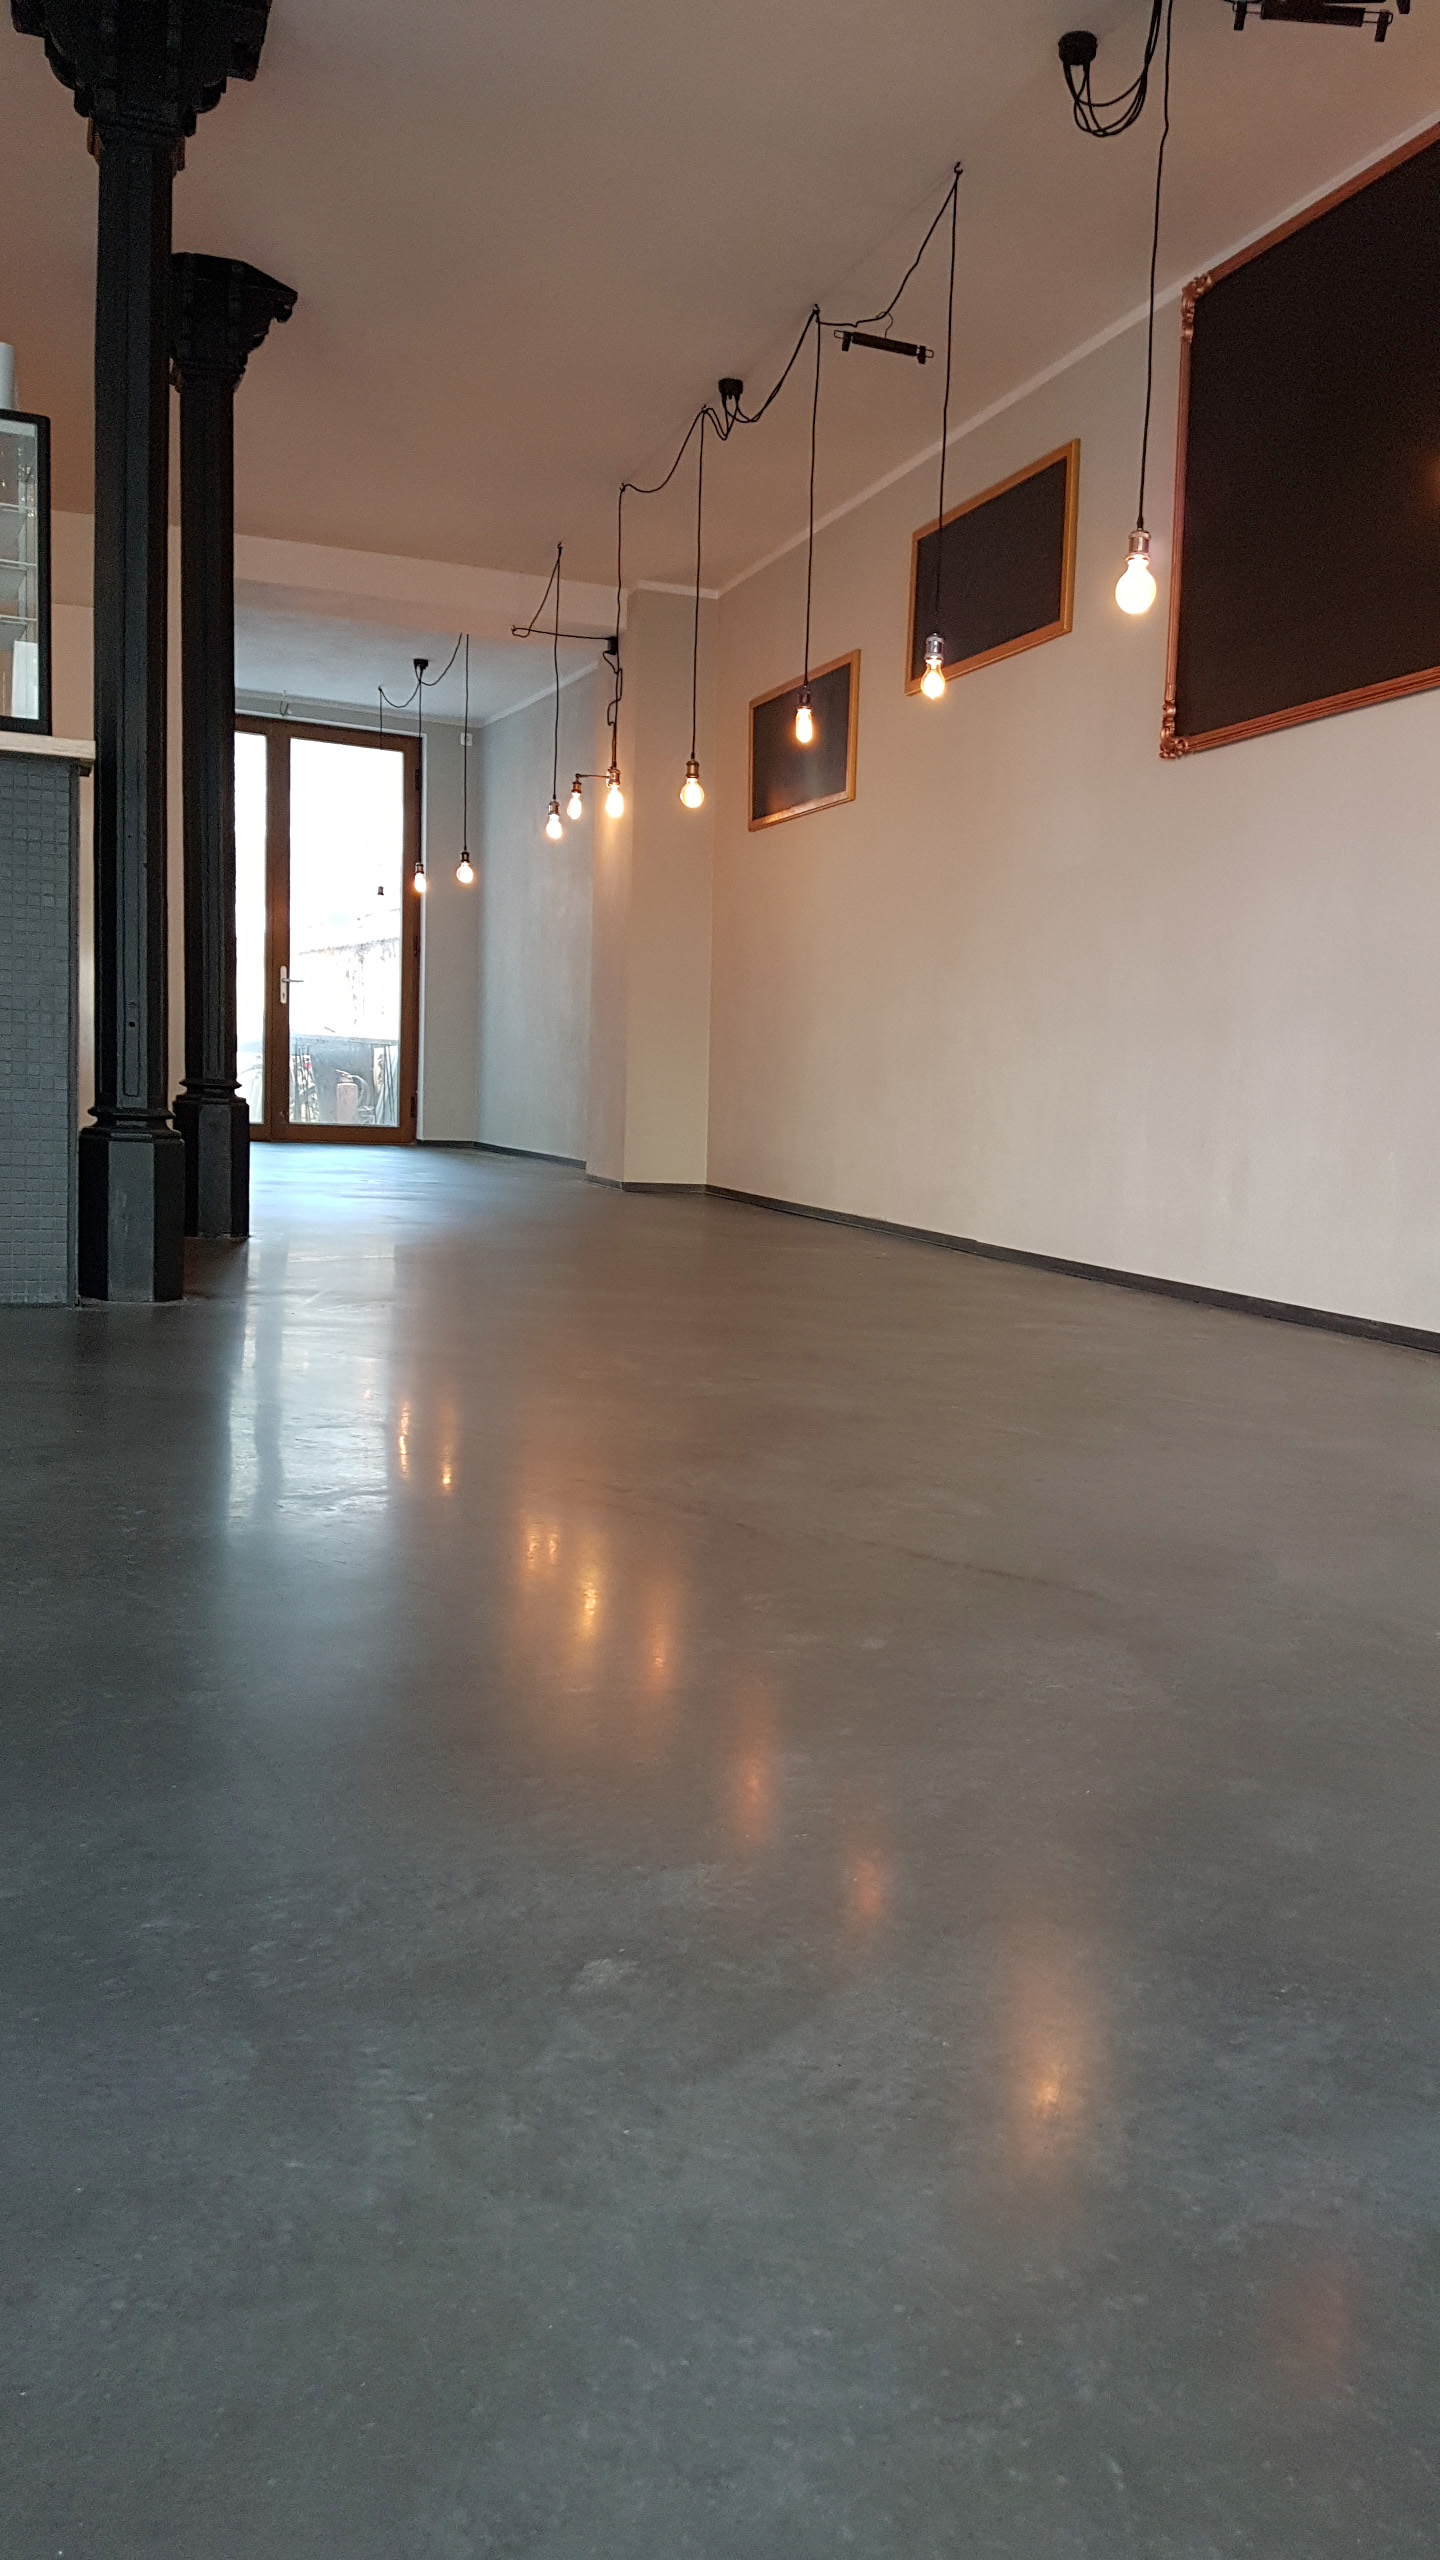 Sicht Estrich lebkuchen fußbodentechnik gmbh dot agentur cms builder